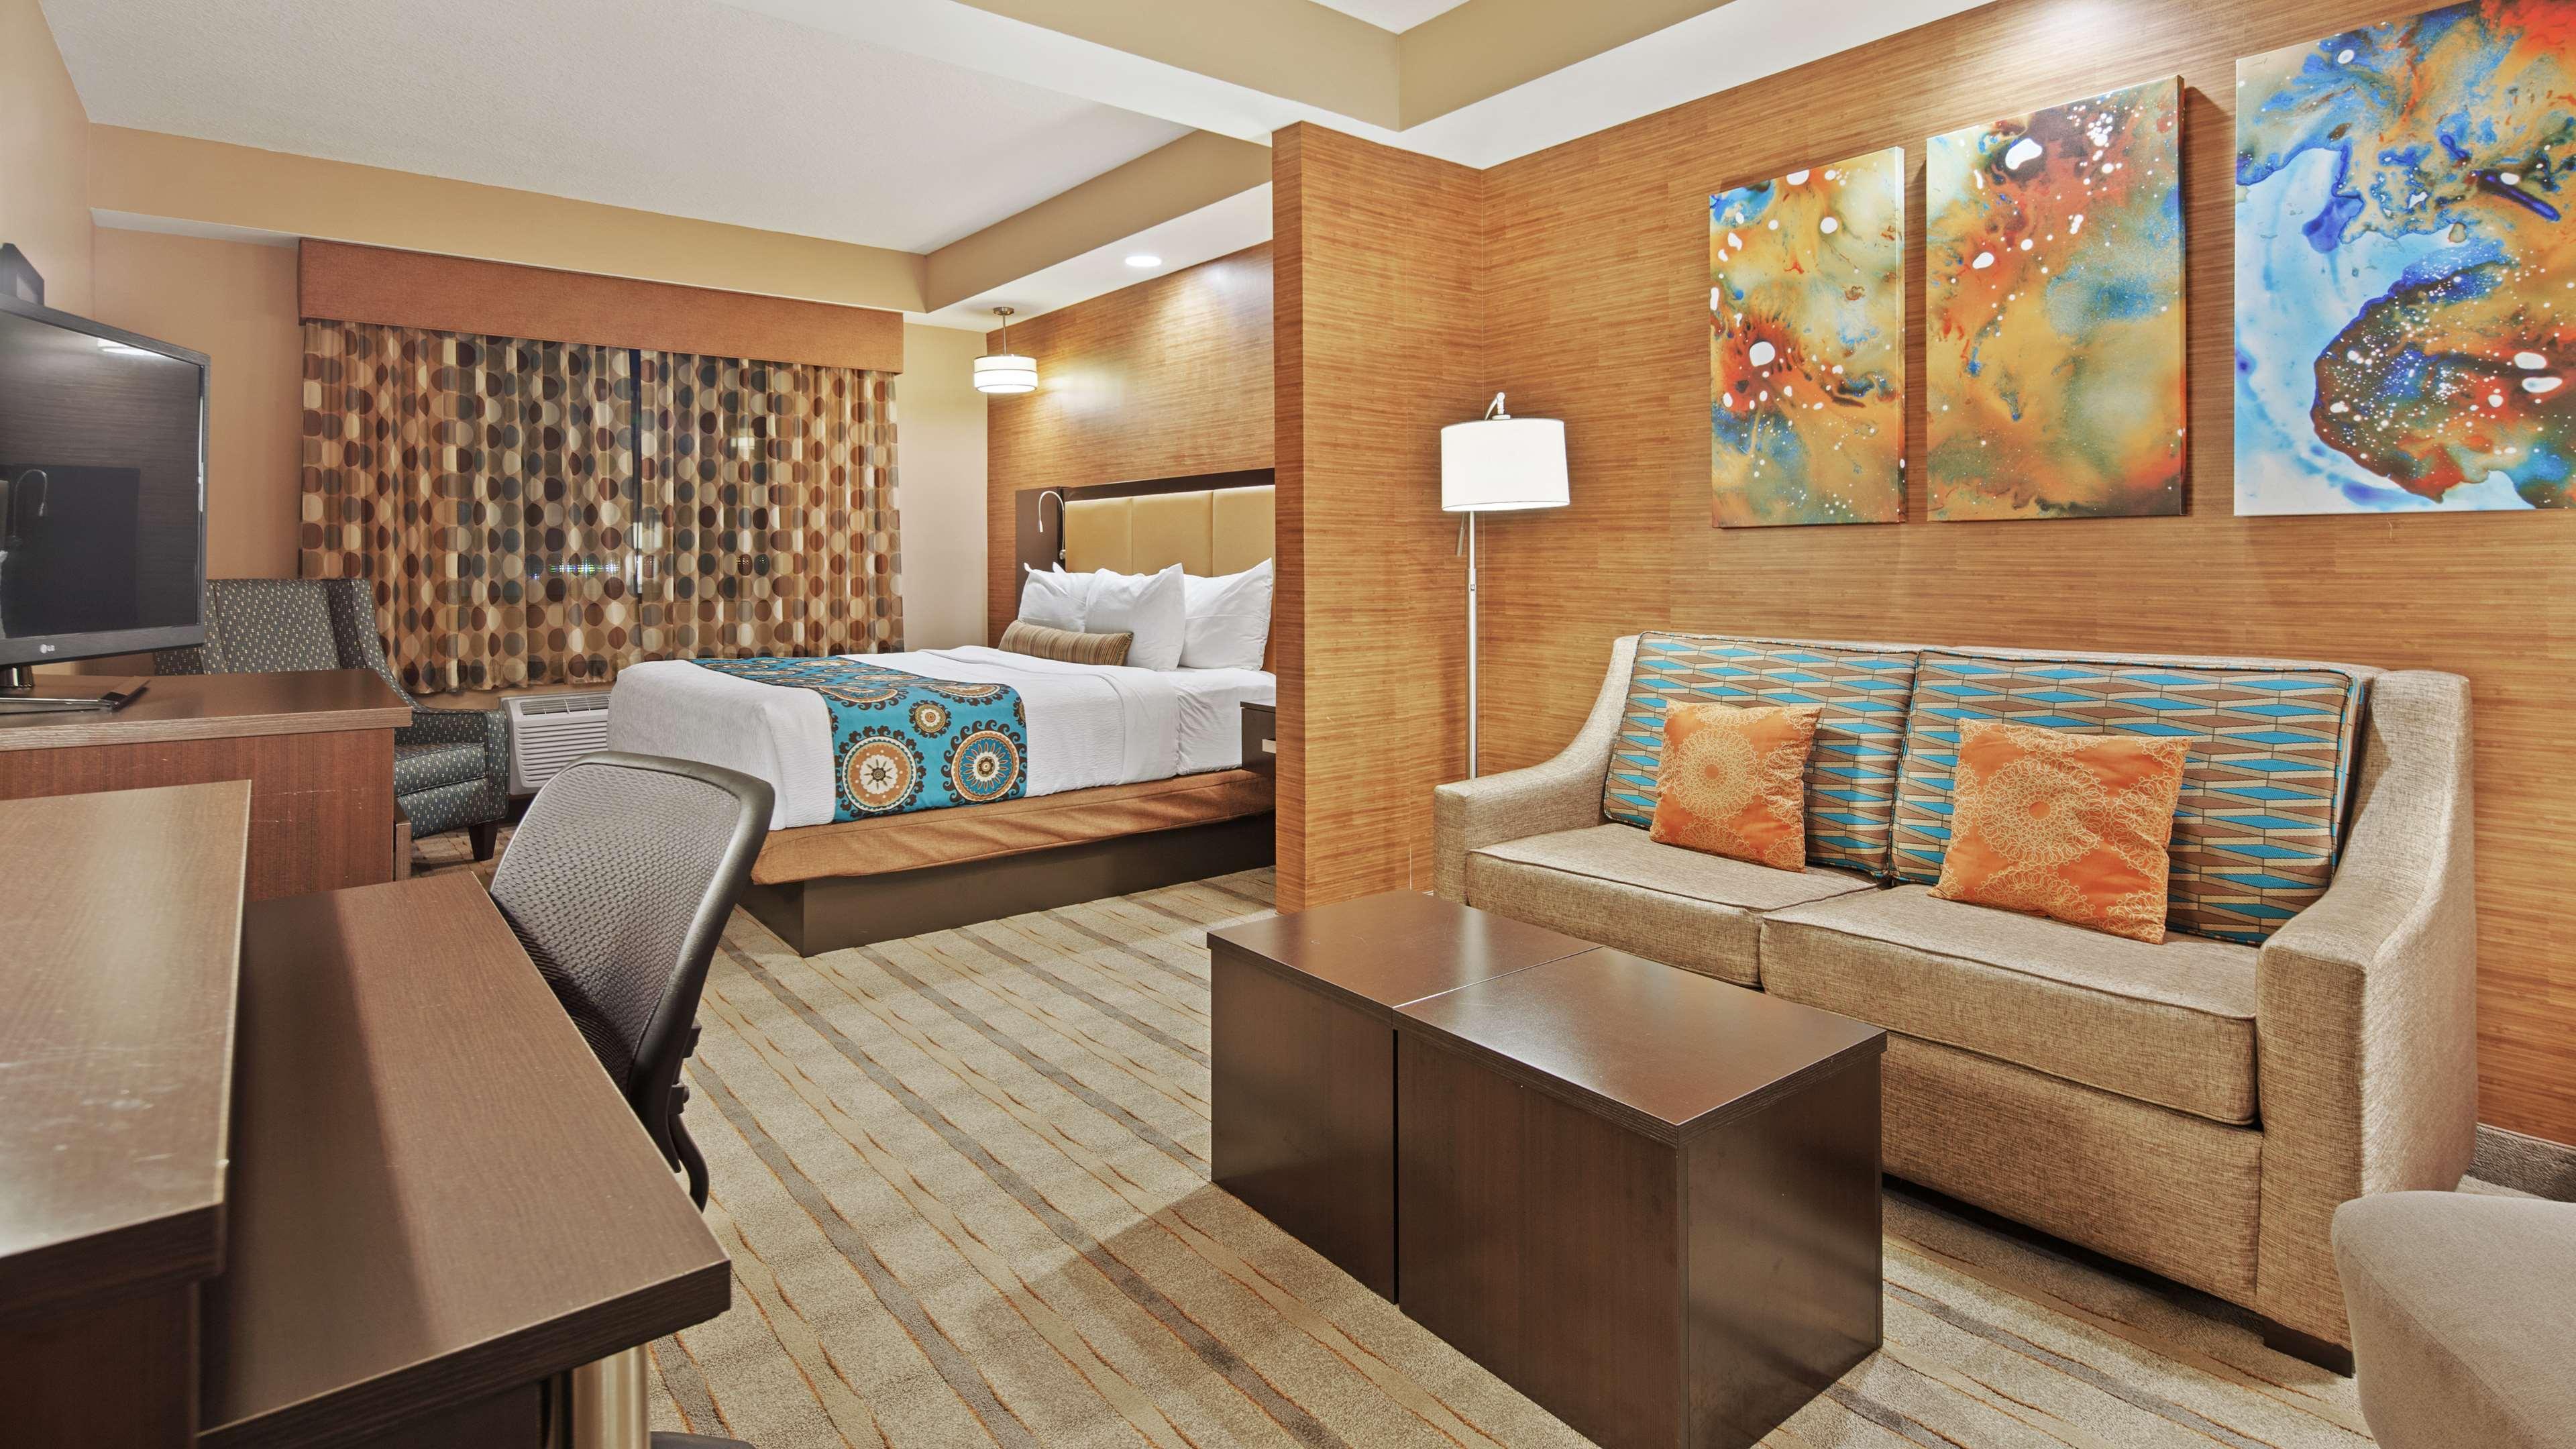 Best Western Plus Kendall Airport Hotel & Suites image 14